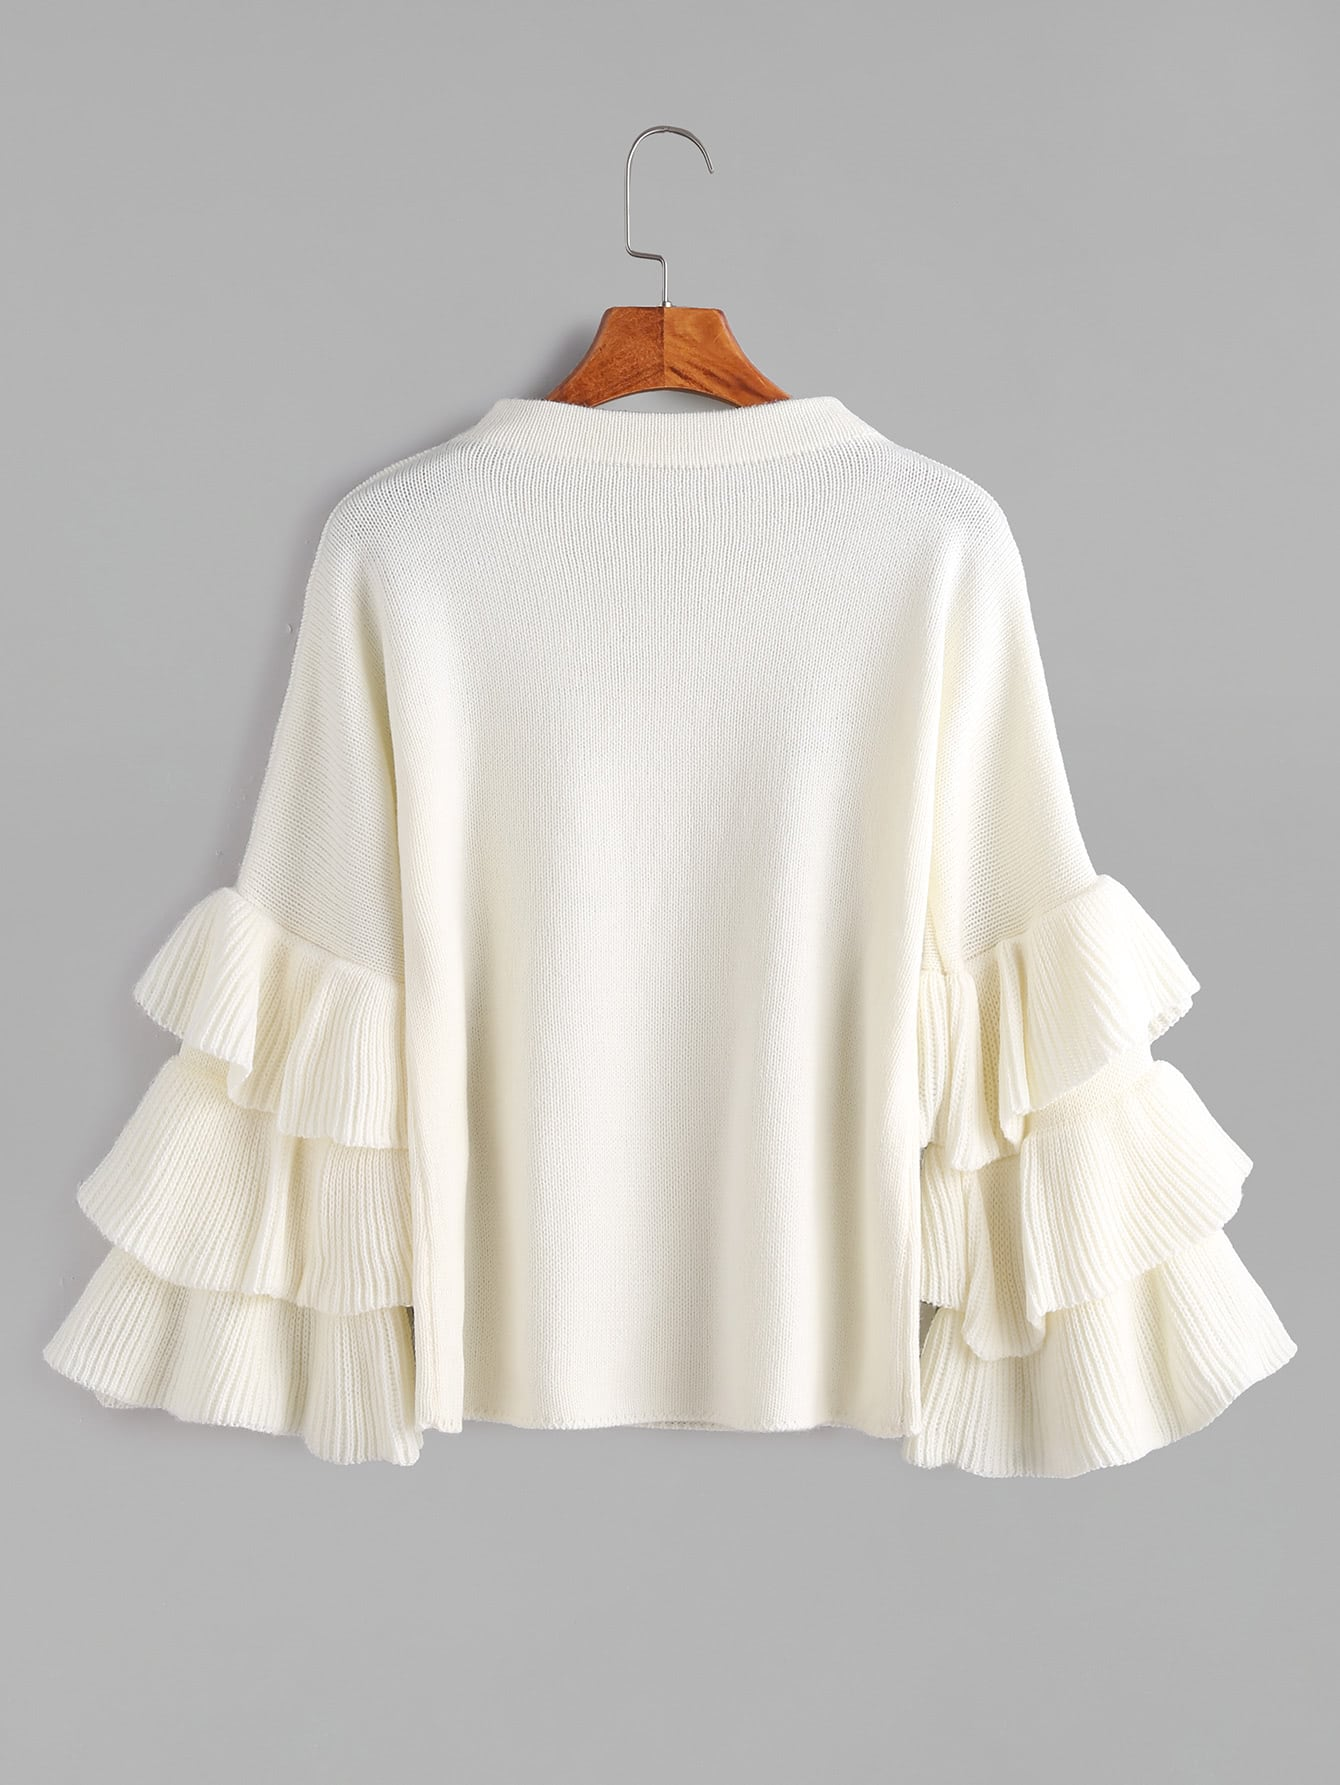 sweater161108457_2